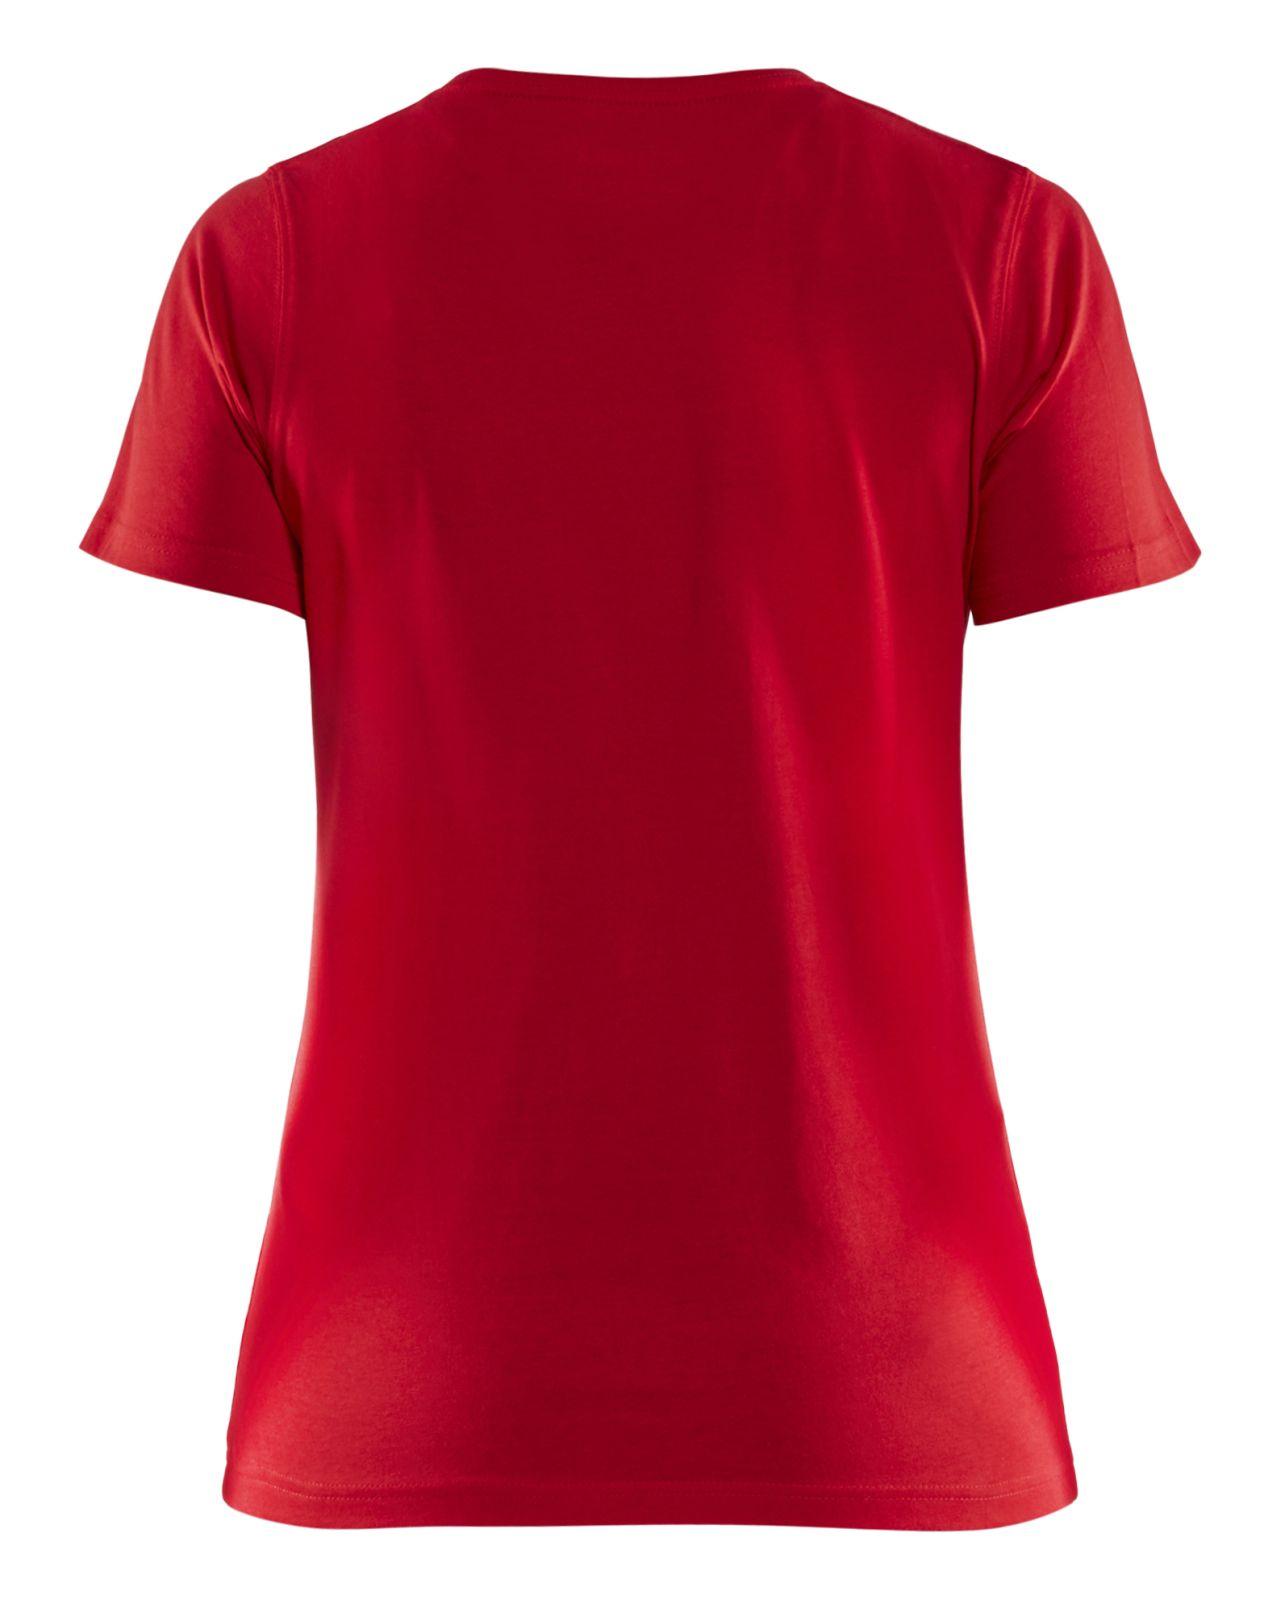 Blaklader Dames T-shirts 33341042 rood(5600)